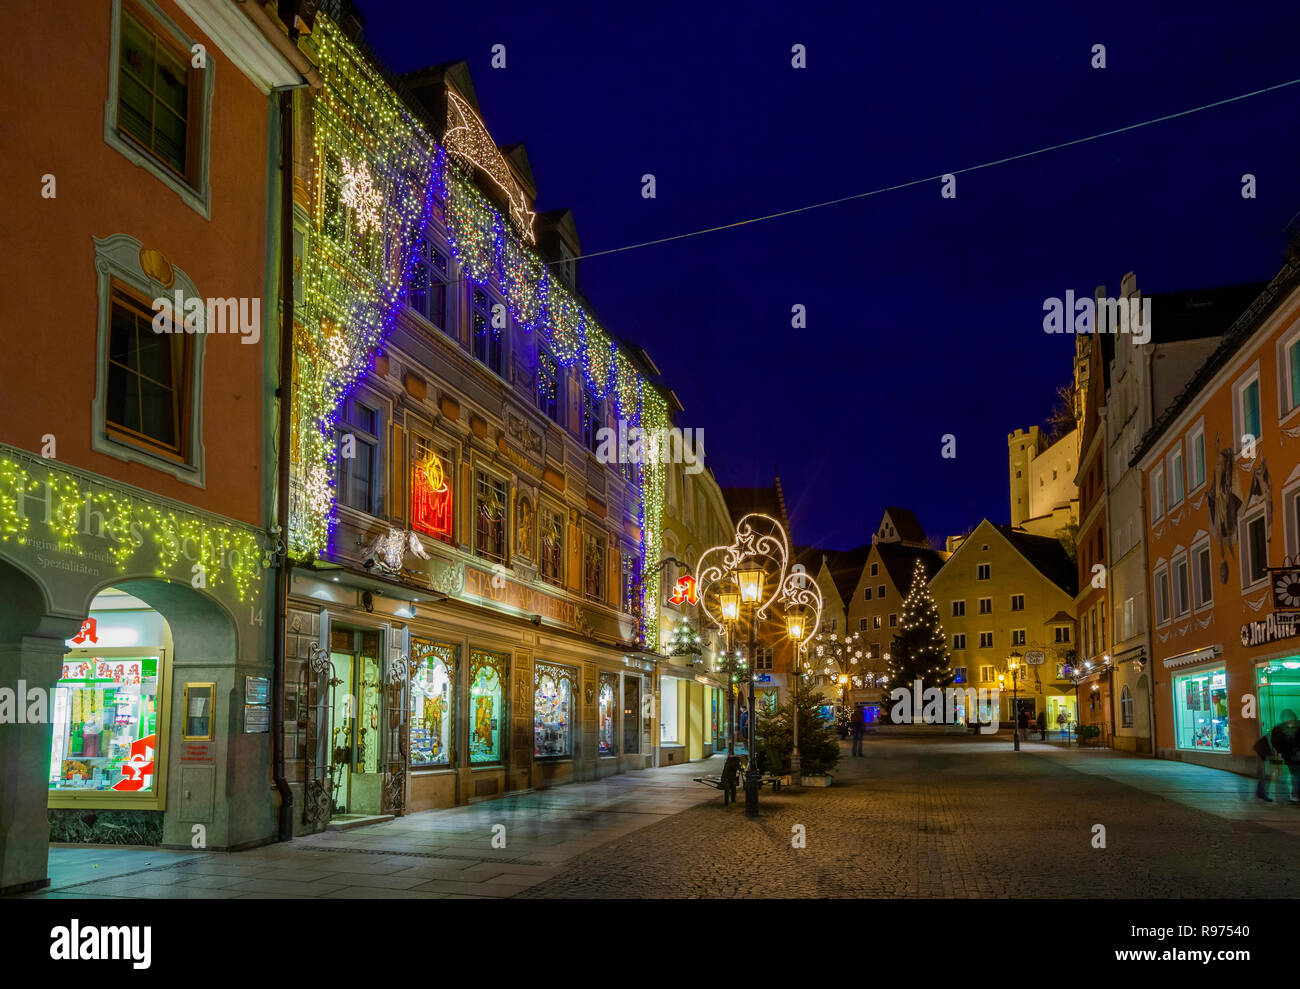 Christmas decorations, Fussen, Germany - Stock Image